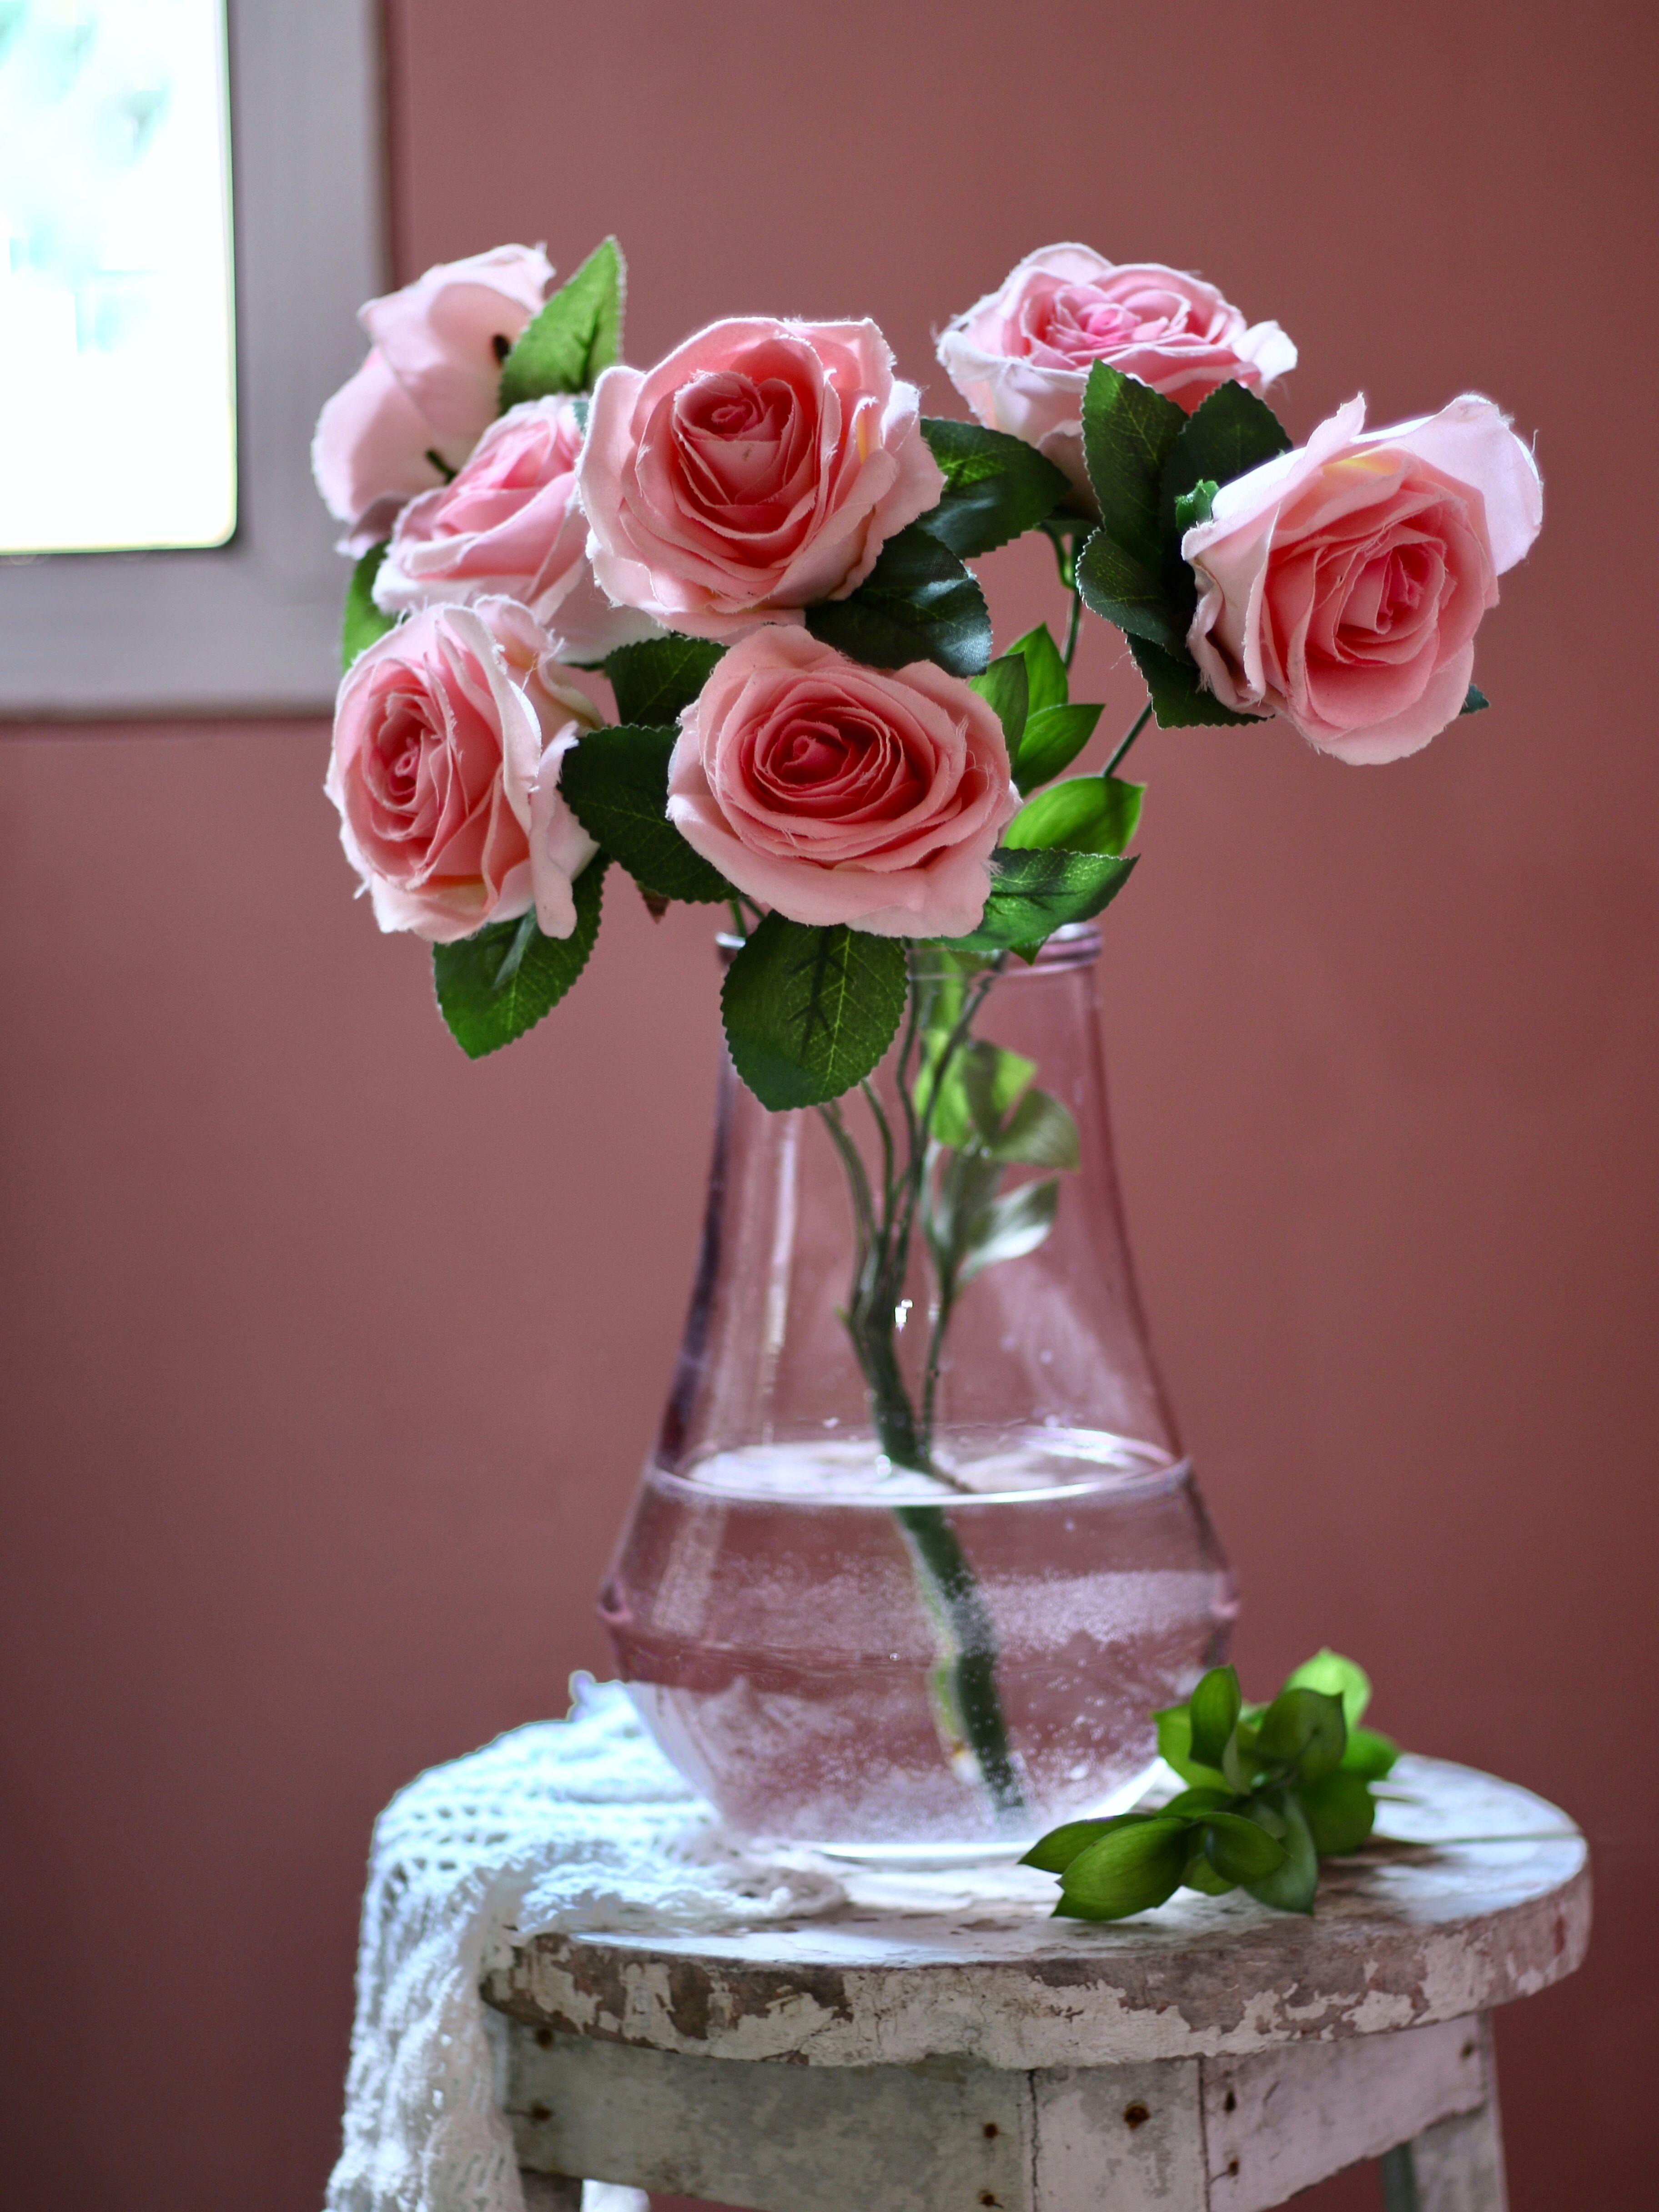 Pinky Rose Photo By Lestijoe Rose Photos Pinky Rose Beautiful Flowers